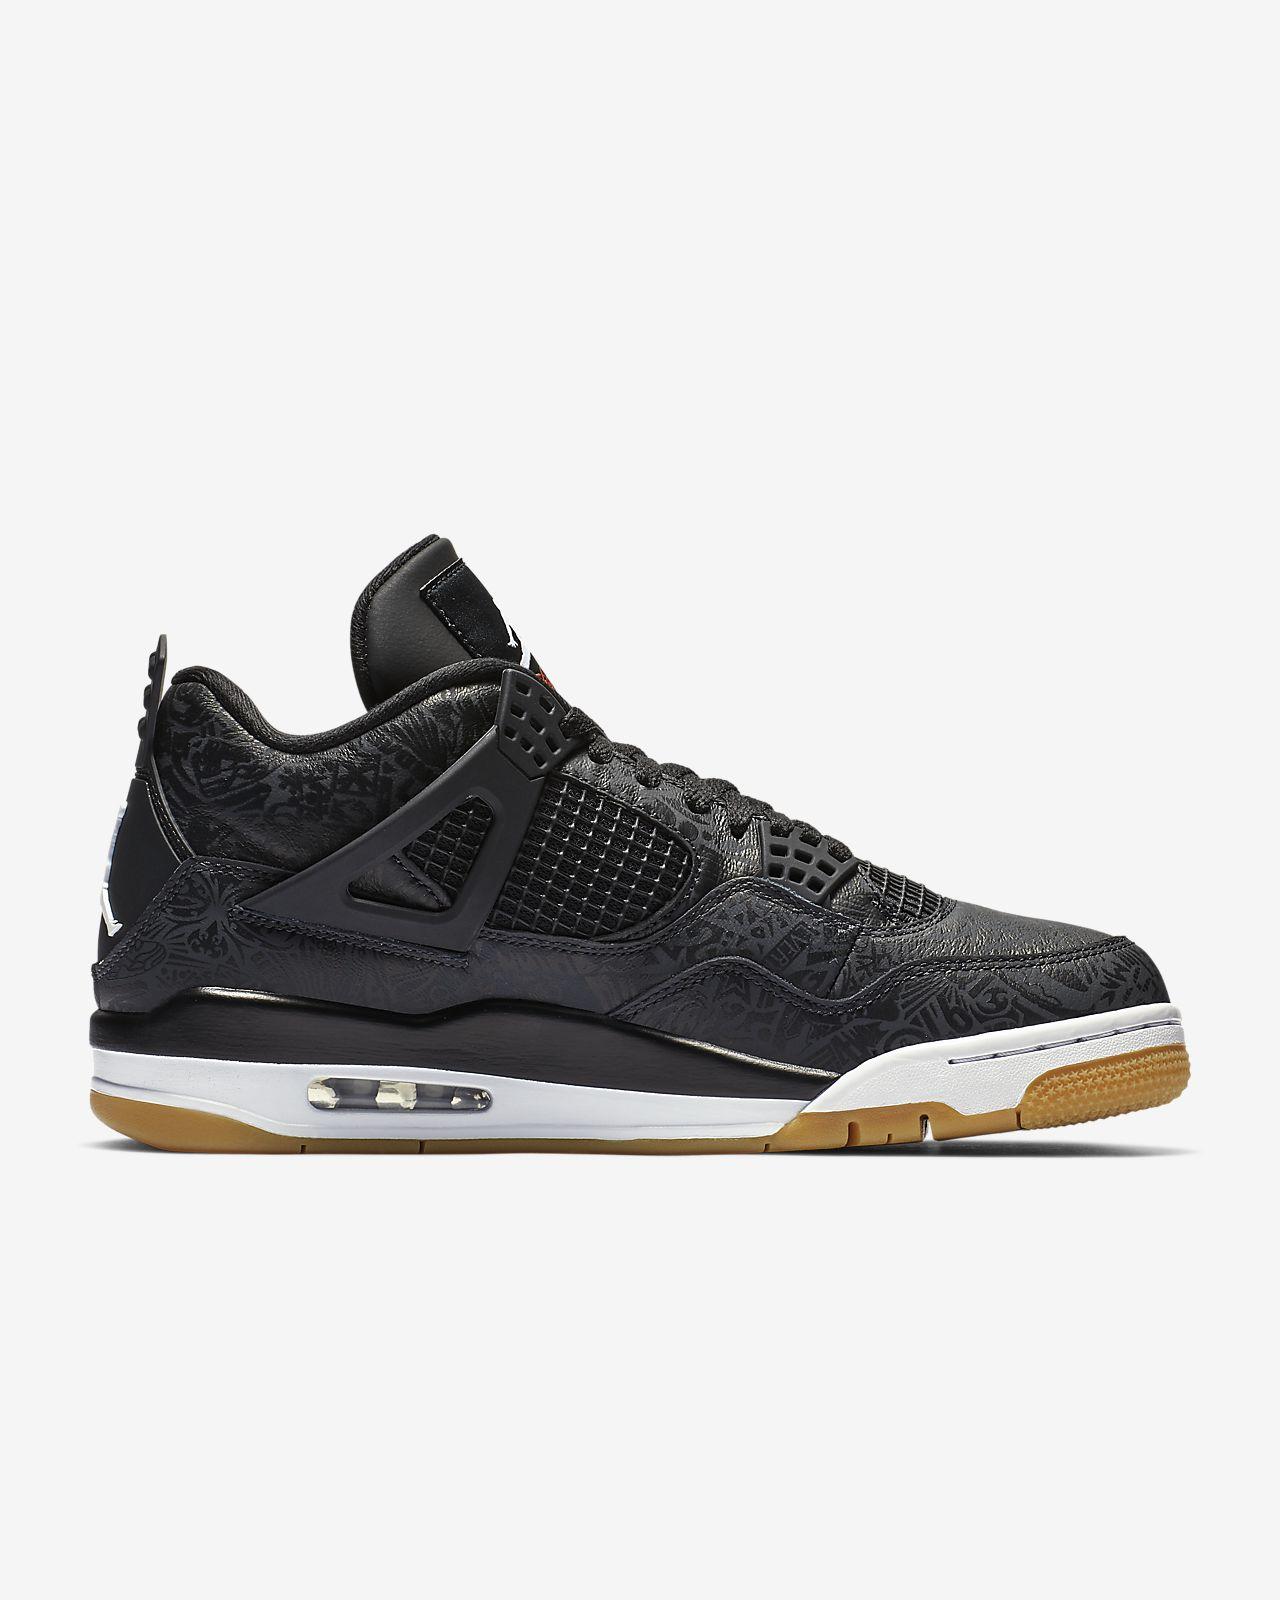 43333525c Air Jordan 4 Retro SE Men s Shoe. Nike.com ID